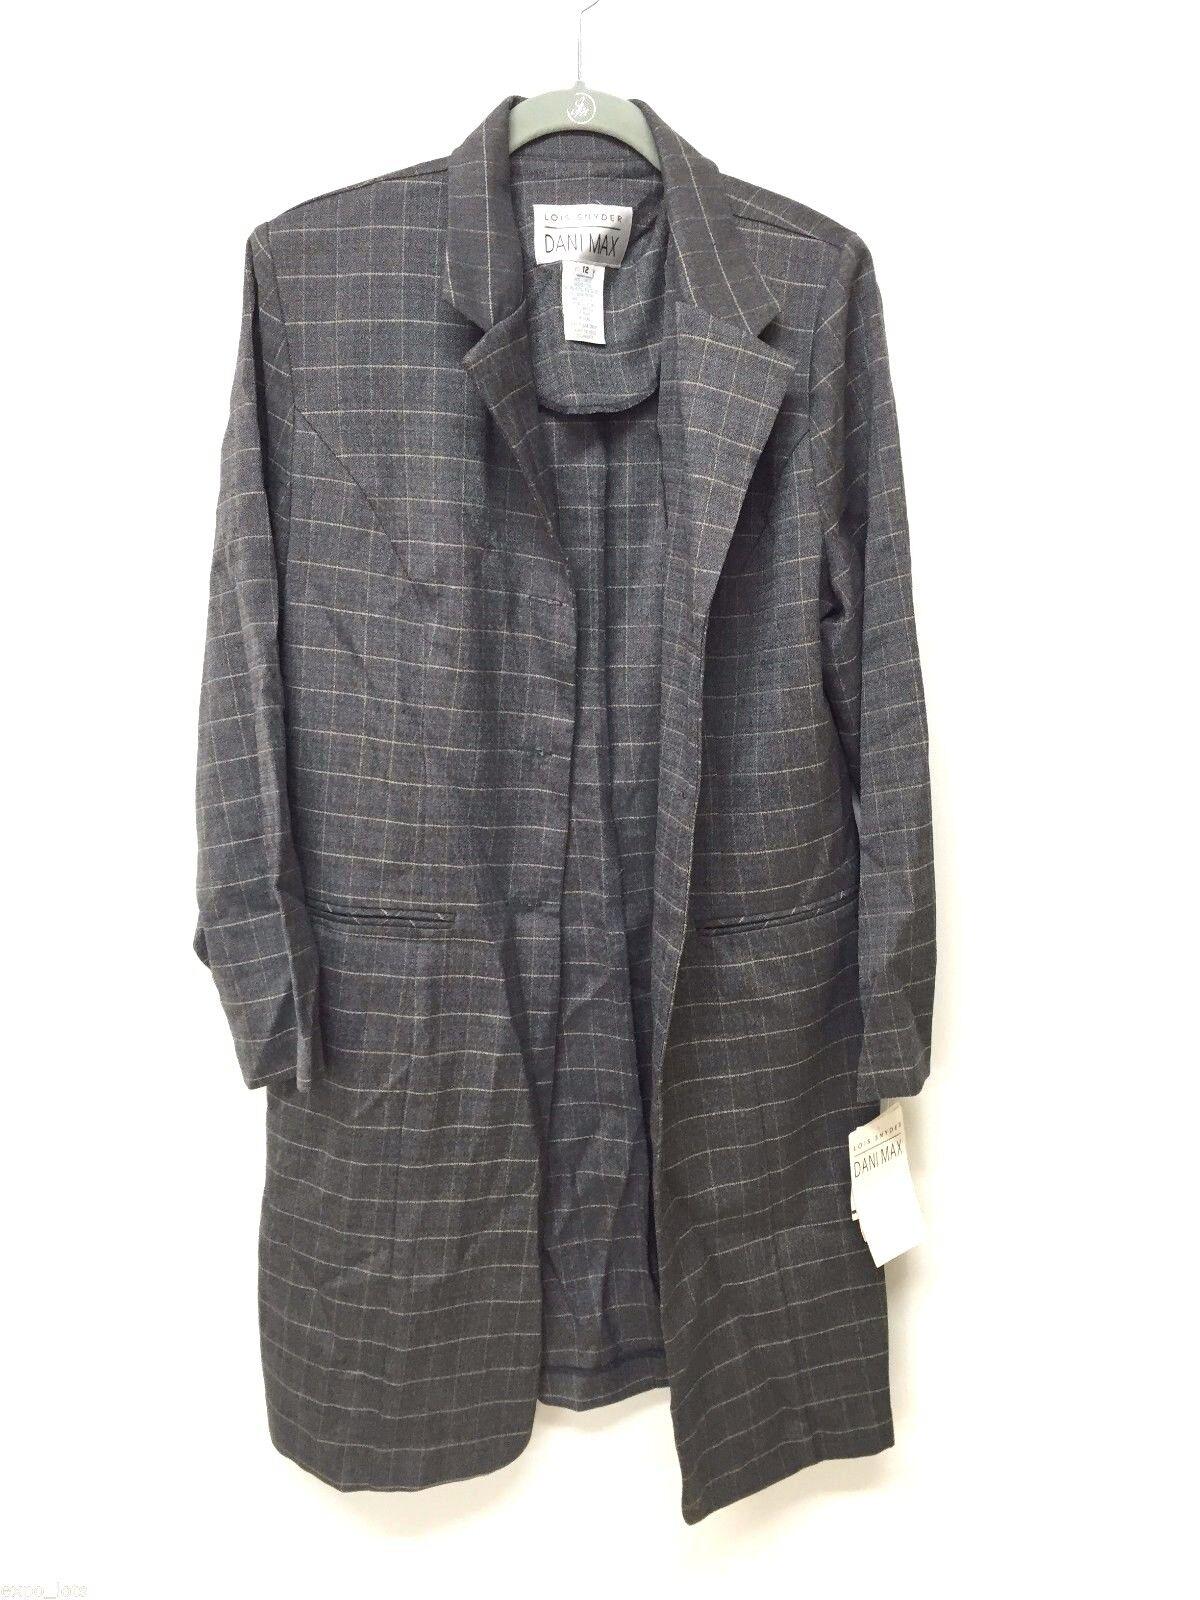 NWT Dani Max Womens Charcoal Coat Size 12